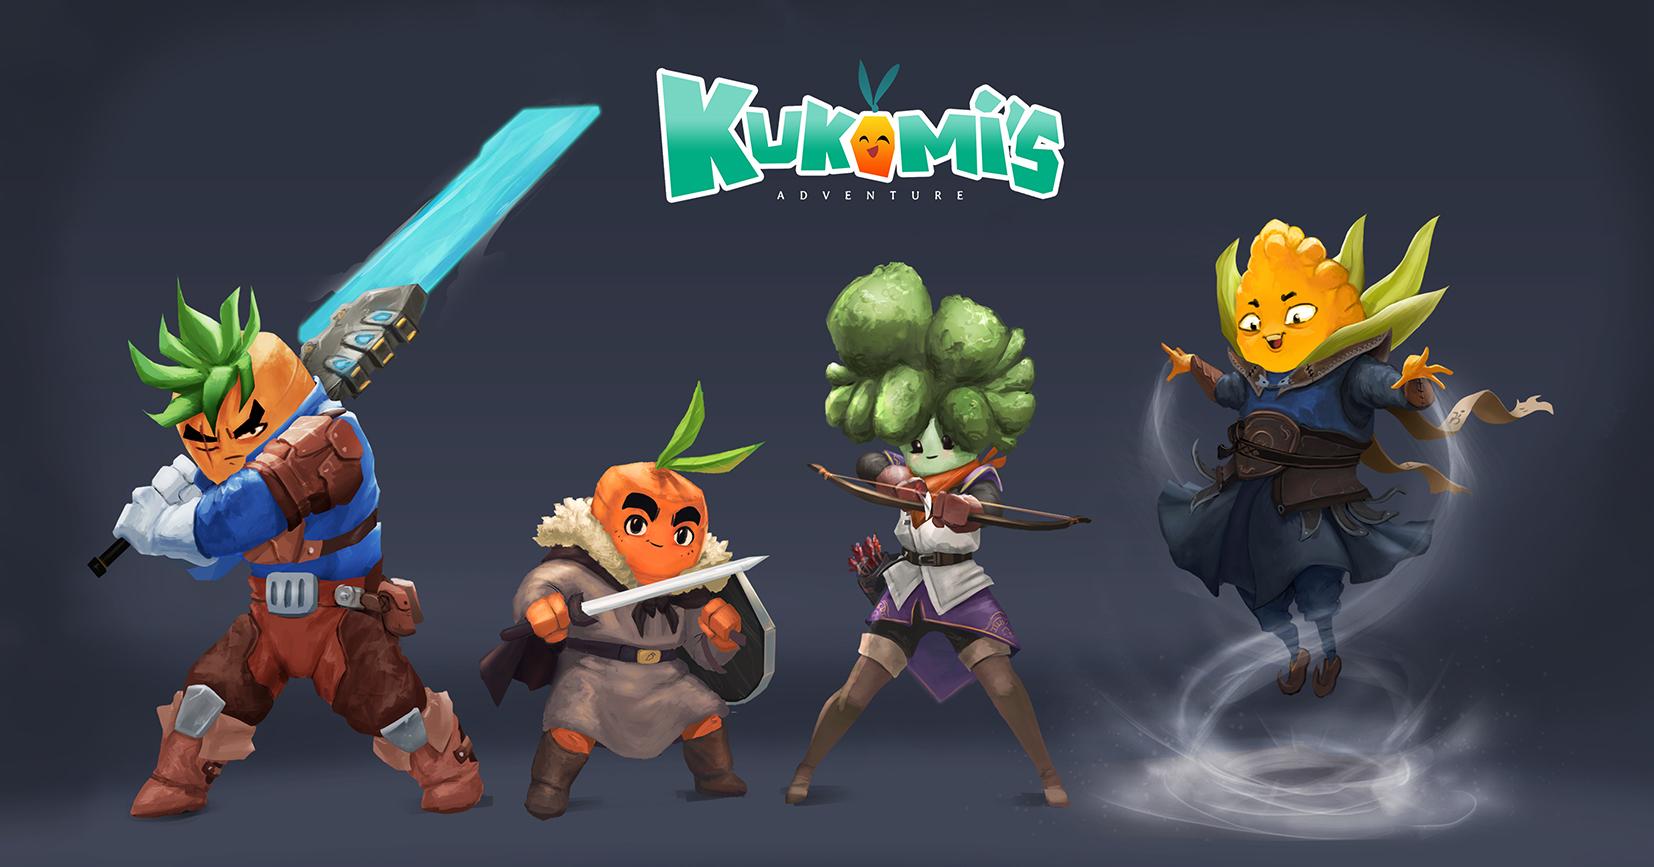 Kukomi's Adventure